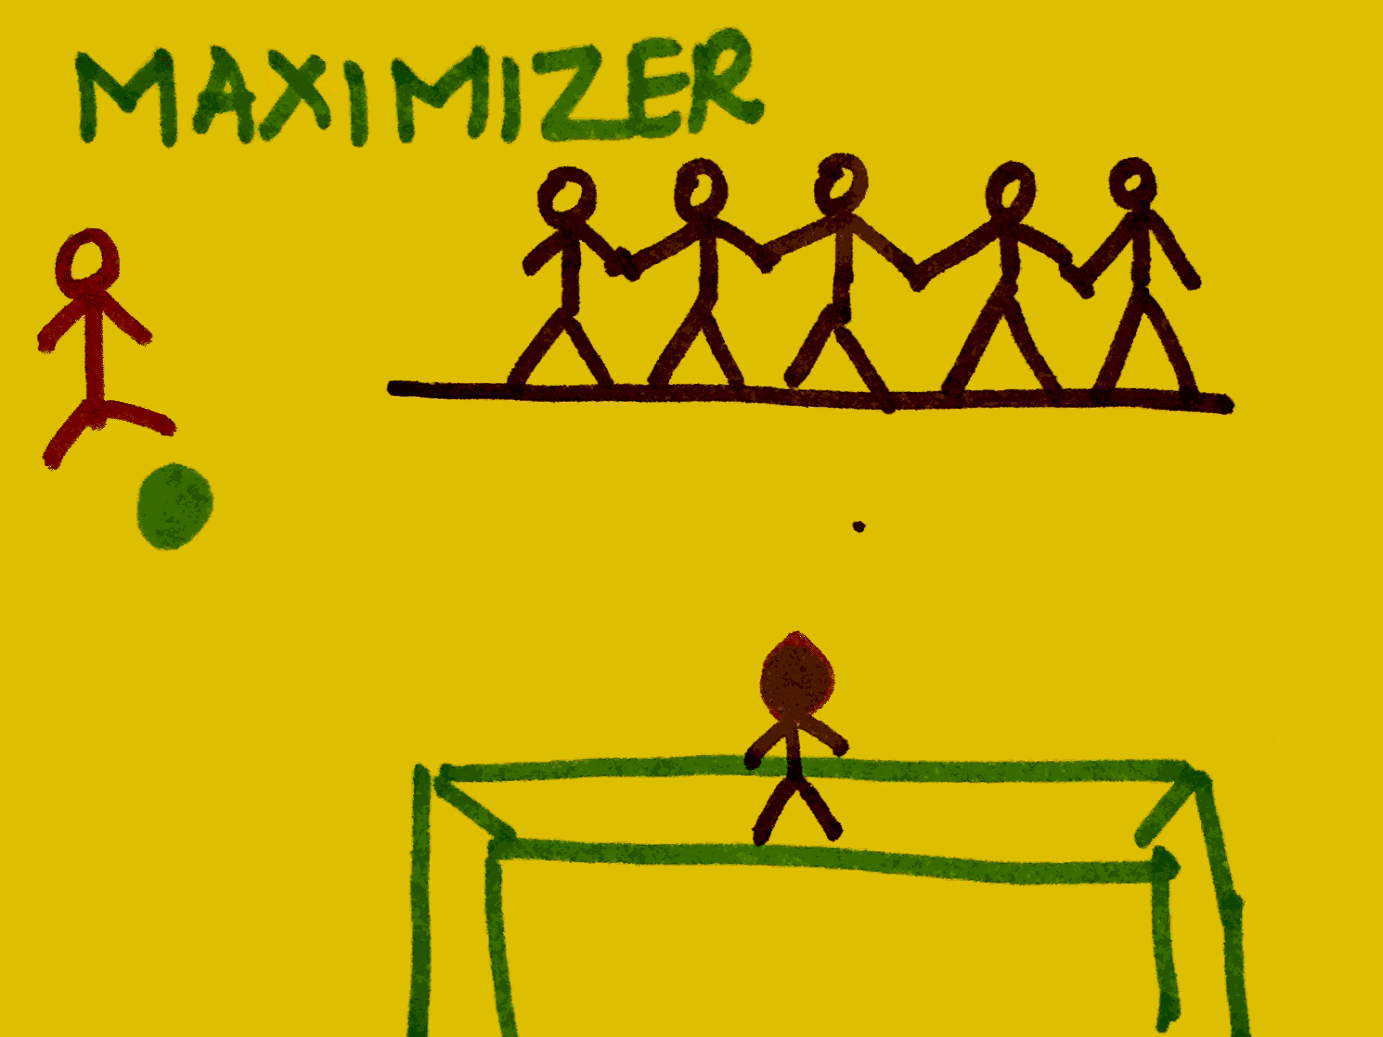 Maximizer StrengthsFinder Singapore Soccer Goalkeeper